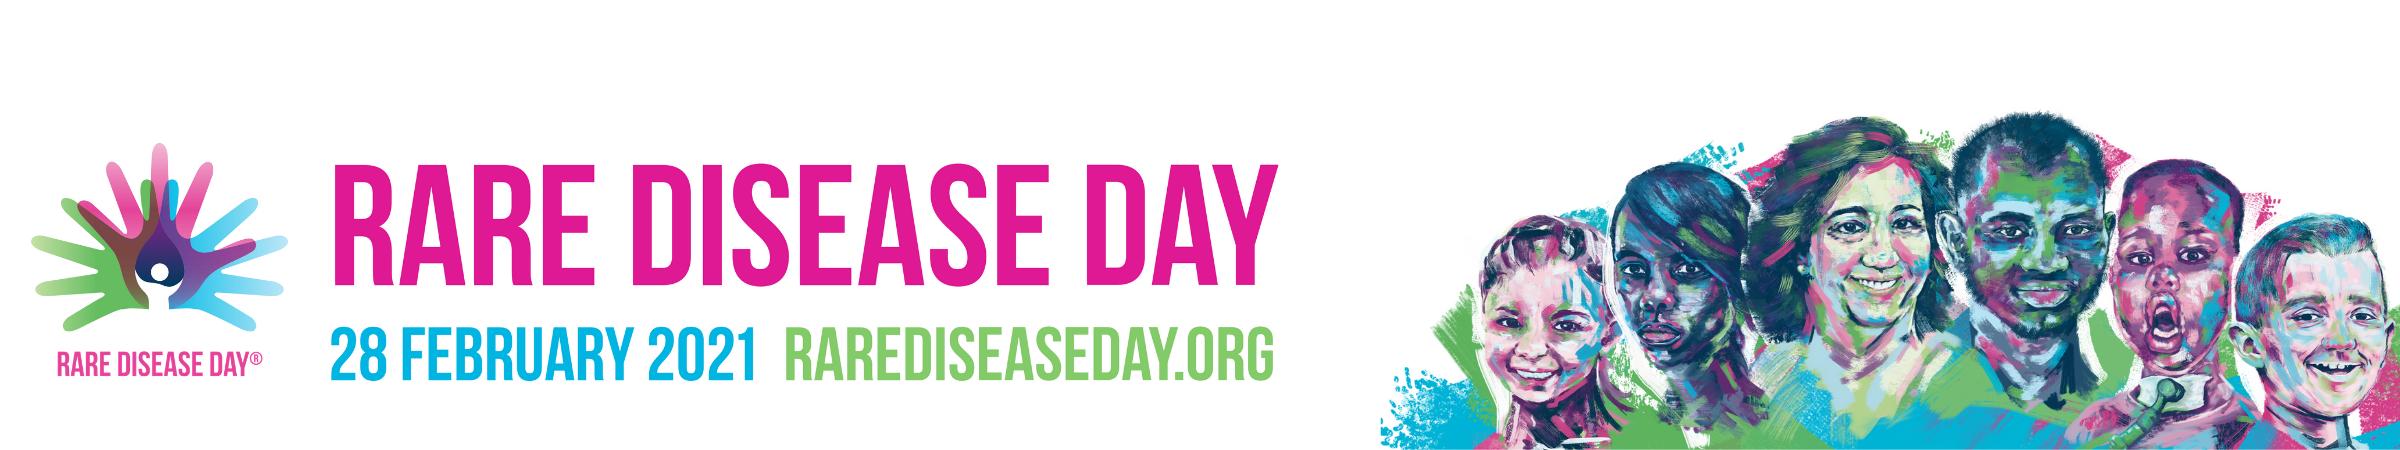 Rare Disease Day banner